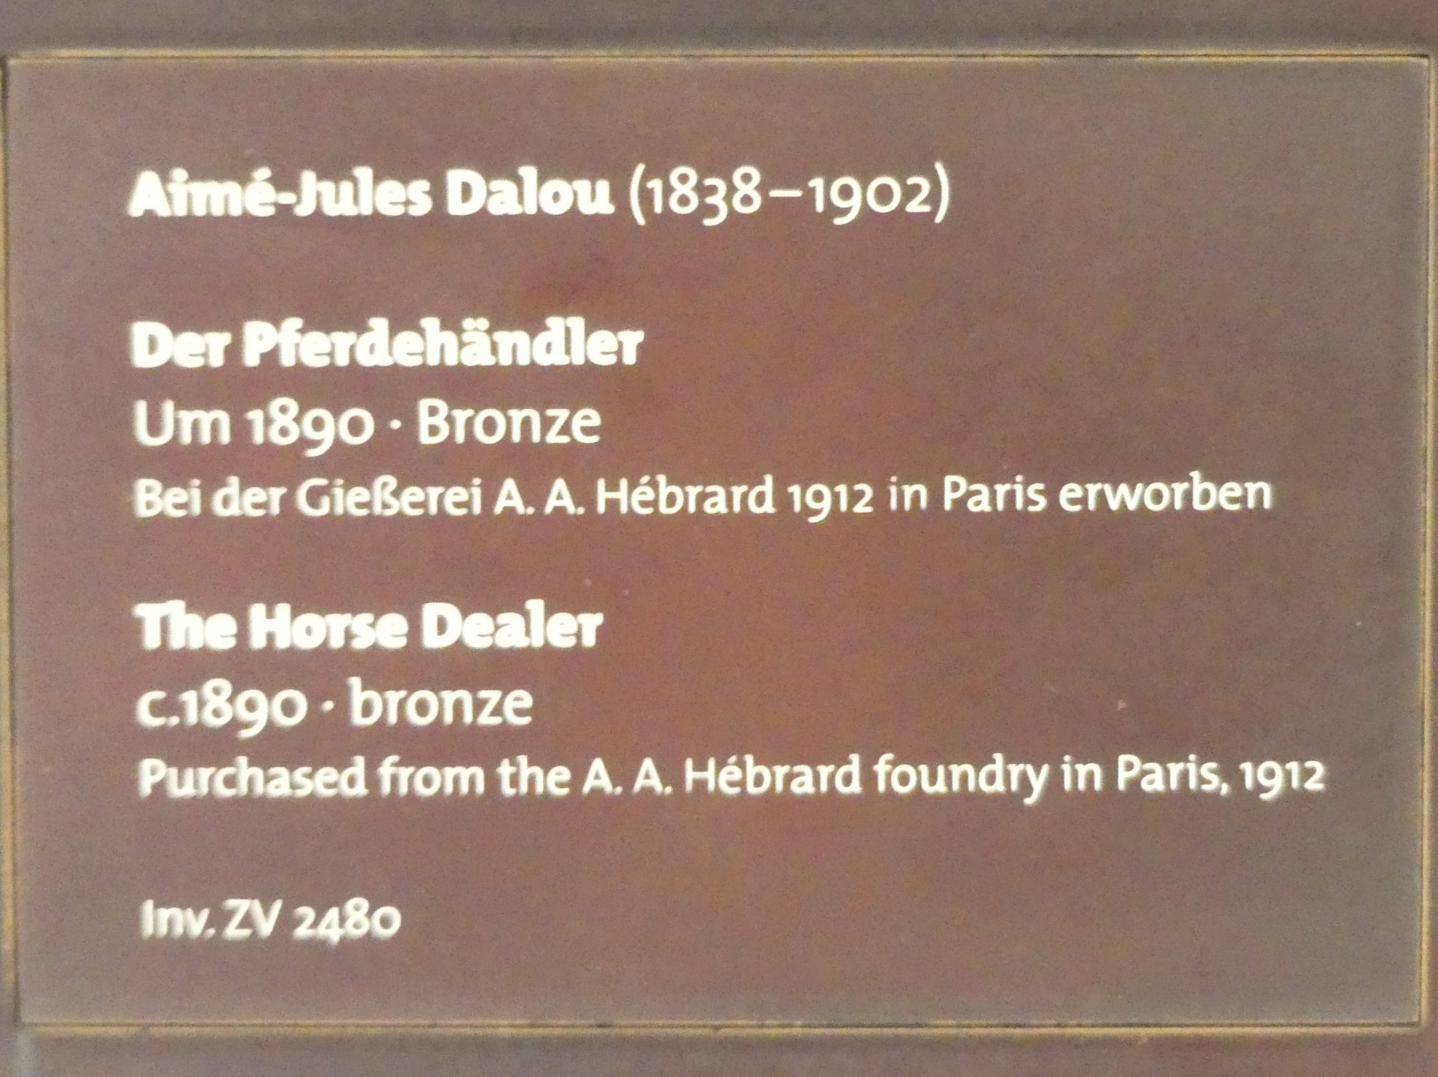 Aimé-Jules Dalou: Der Pferdehändler, um 1890, Bild 3/3